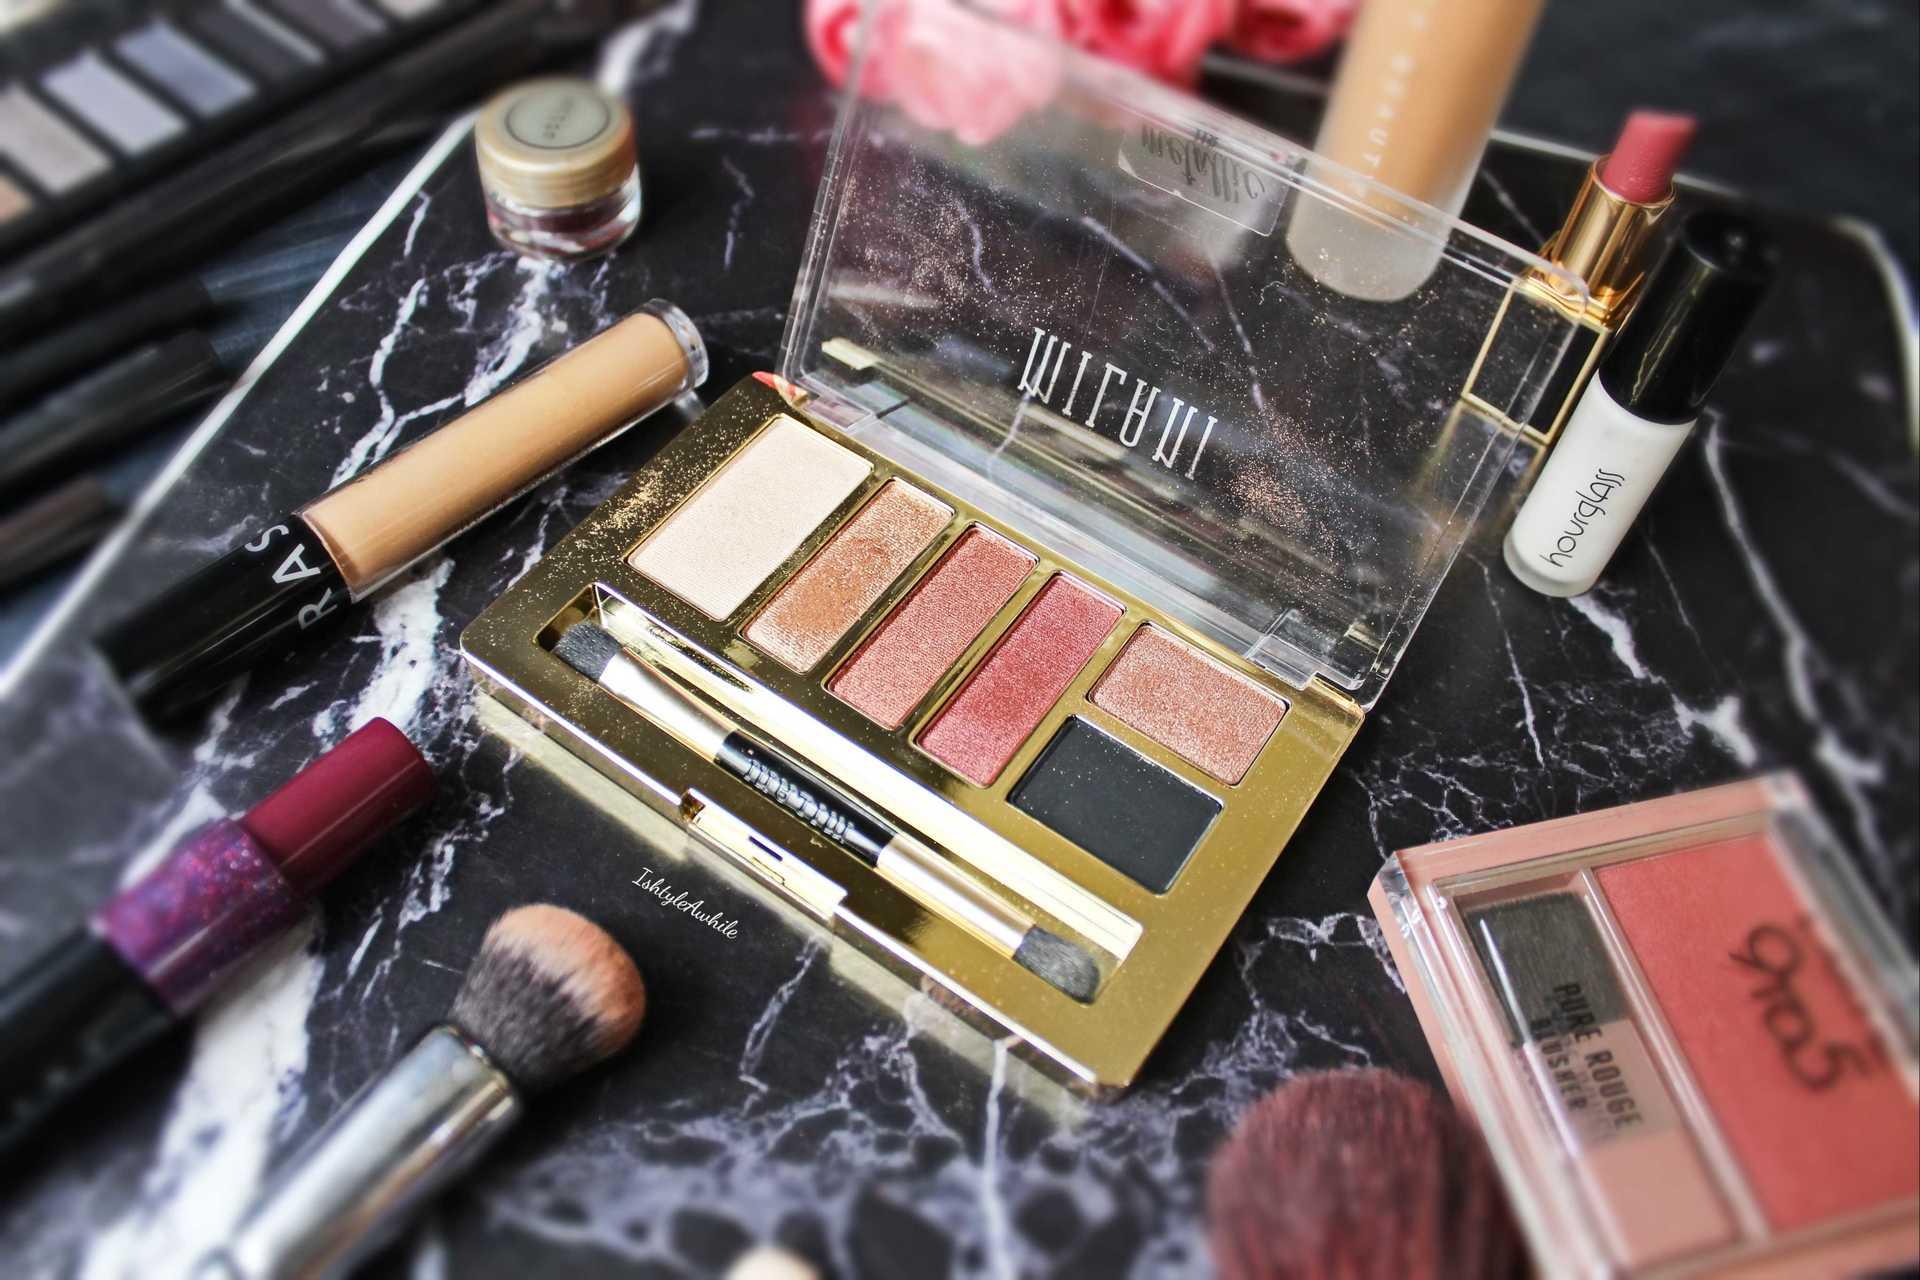 IshtyleAwhile - Milani Metallic eyeshadow chennai beauty blogger